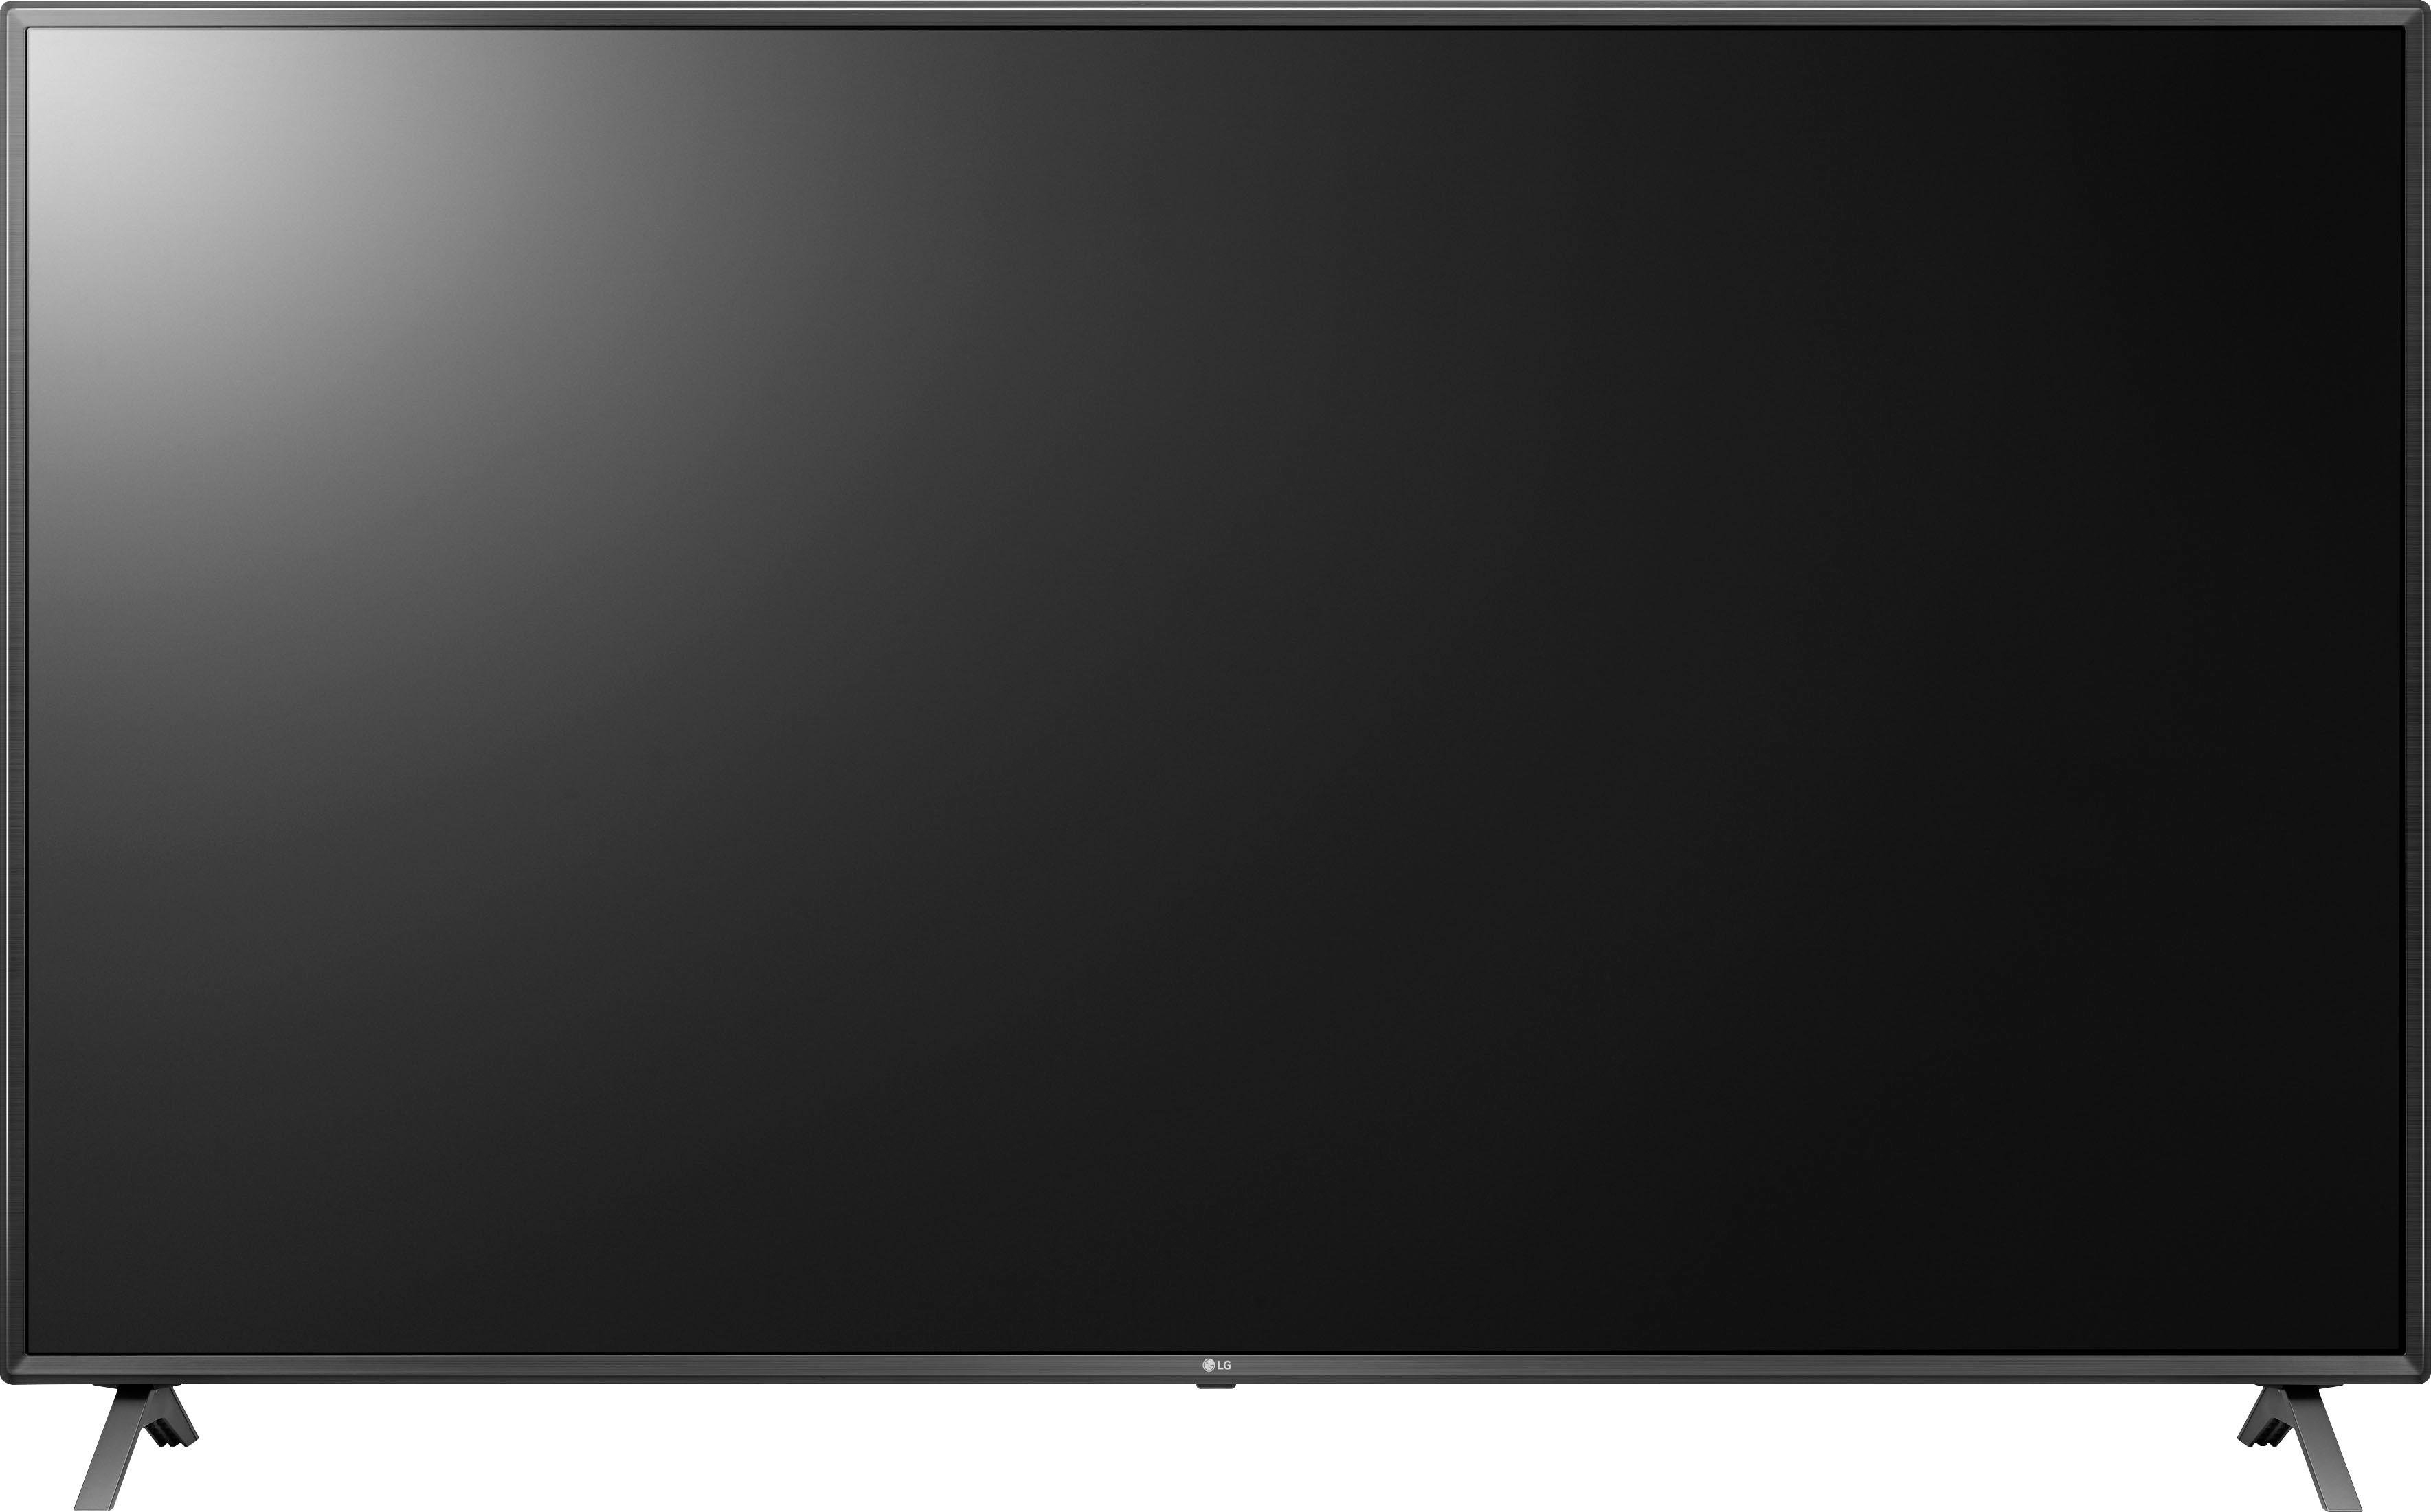 LG 86UN85006LA LED-televisie (217 cm / (86 Inch), 4K Ultra HD, Smart-TV goedkoop op otto.nl kopen